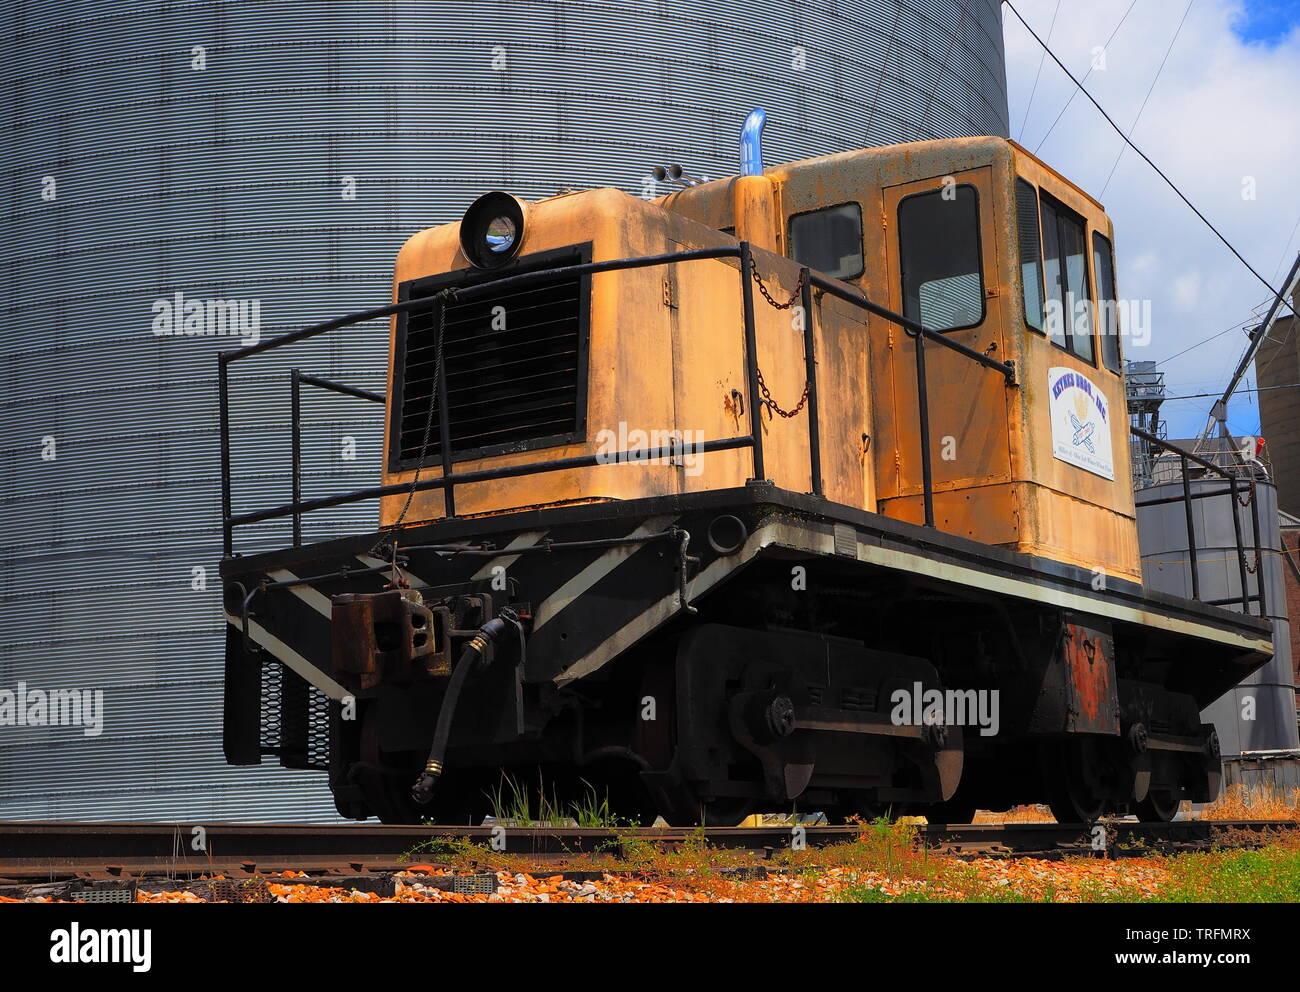 GE switcher locomotive B-B-100  GM-EMD EMD ( Electro-Motive Corporation ) rail road locomotive model 40 - Stock Image